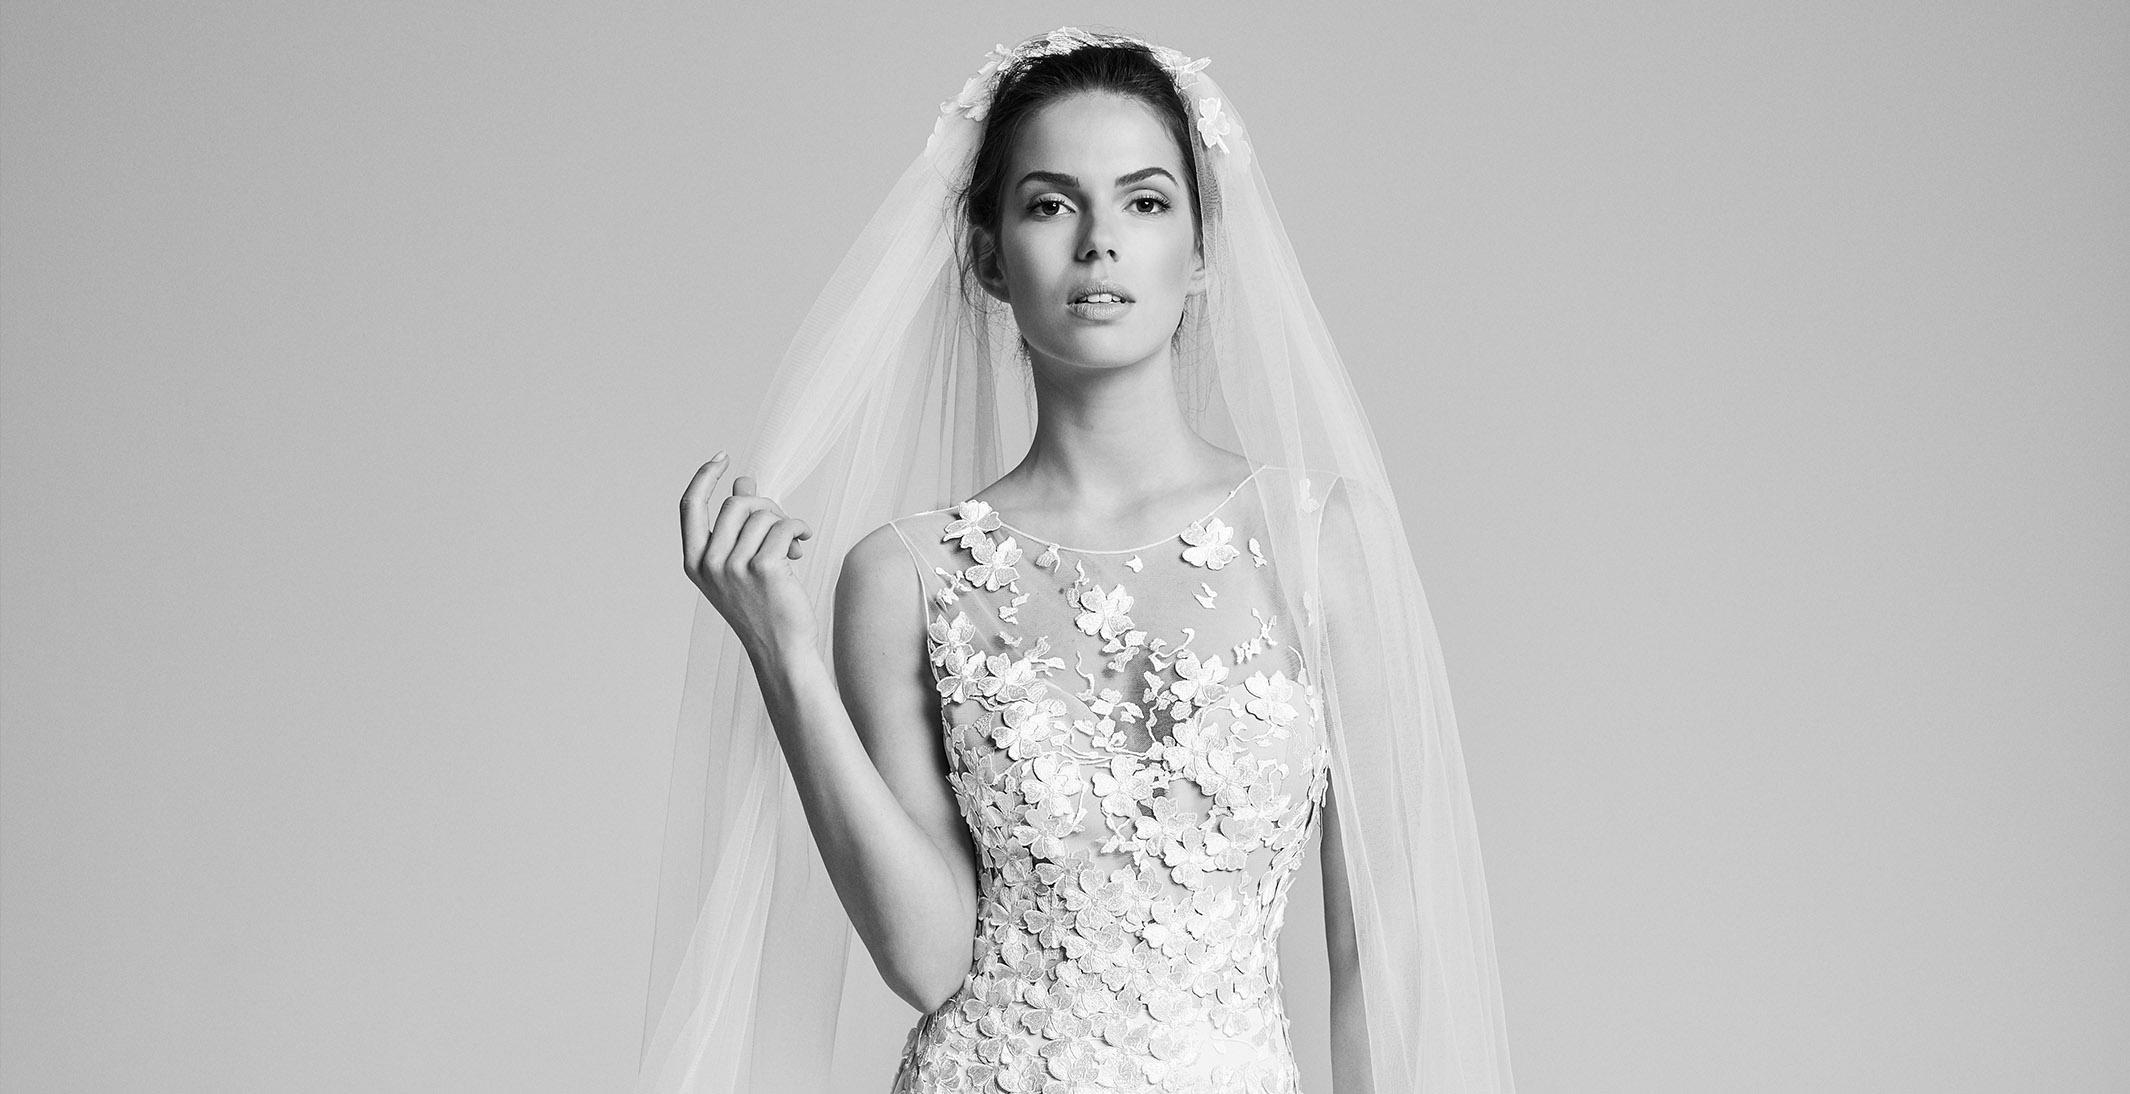 Top 10 Best Wedding Dress Designers In 2019: Designer Wedding Dresses & Couture Bridal UK